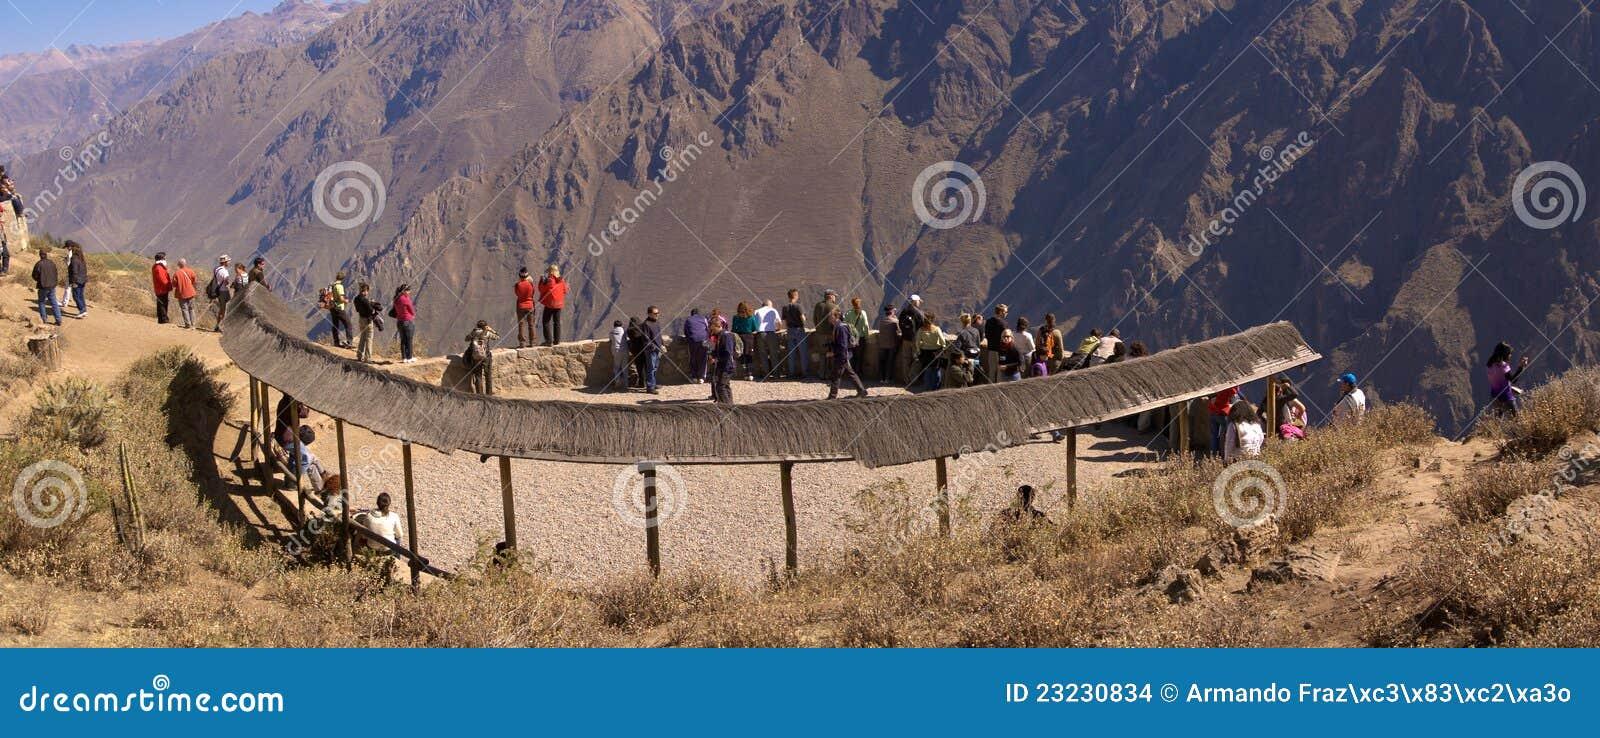 Point de vue de Colca Canyon Cruz del Condor